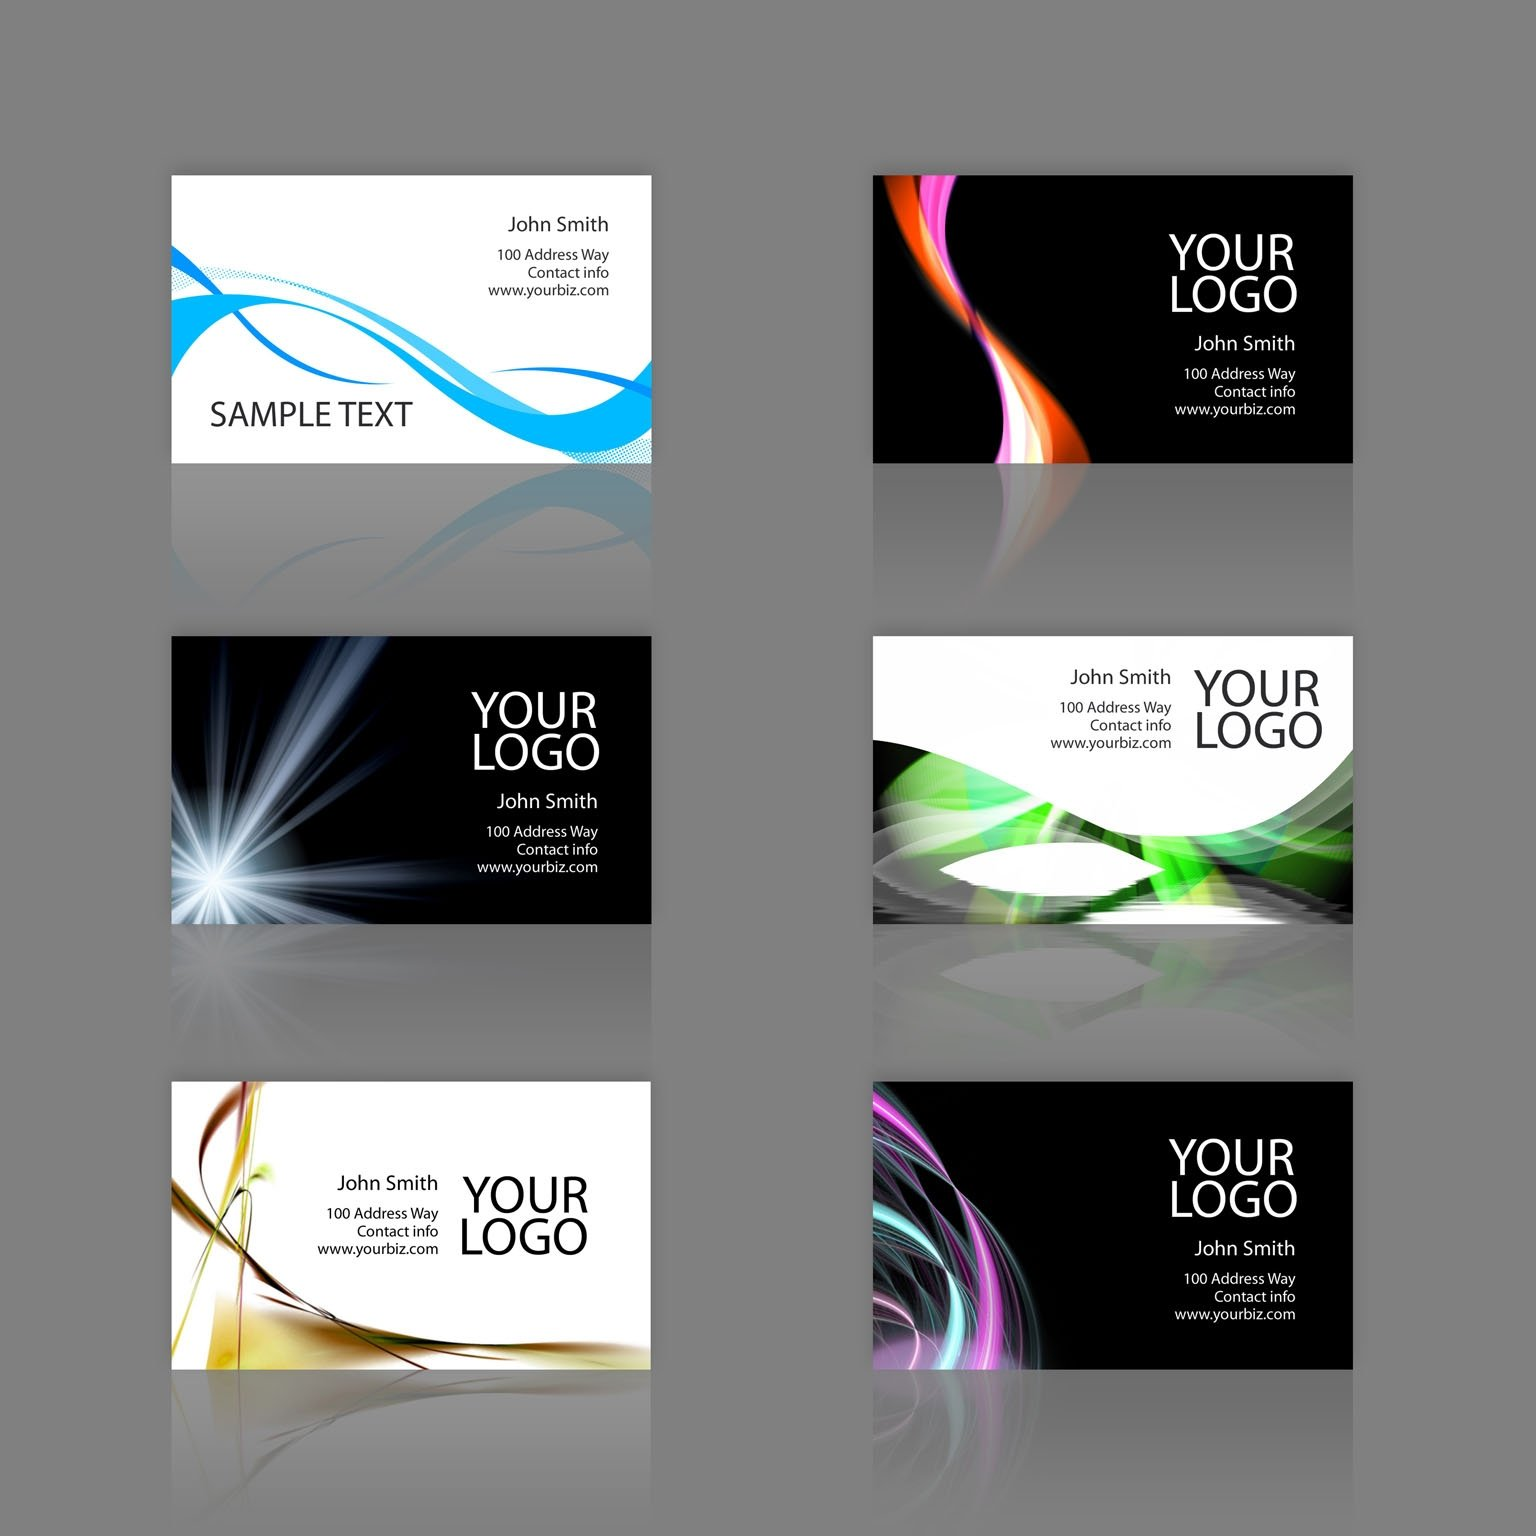 Leaflet Printing, Business Cards - Stockport, Manchester